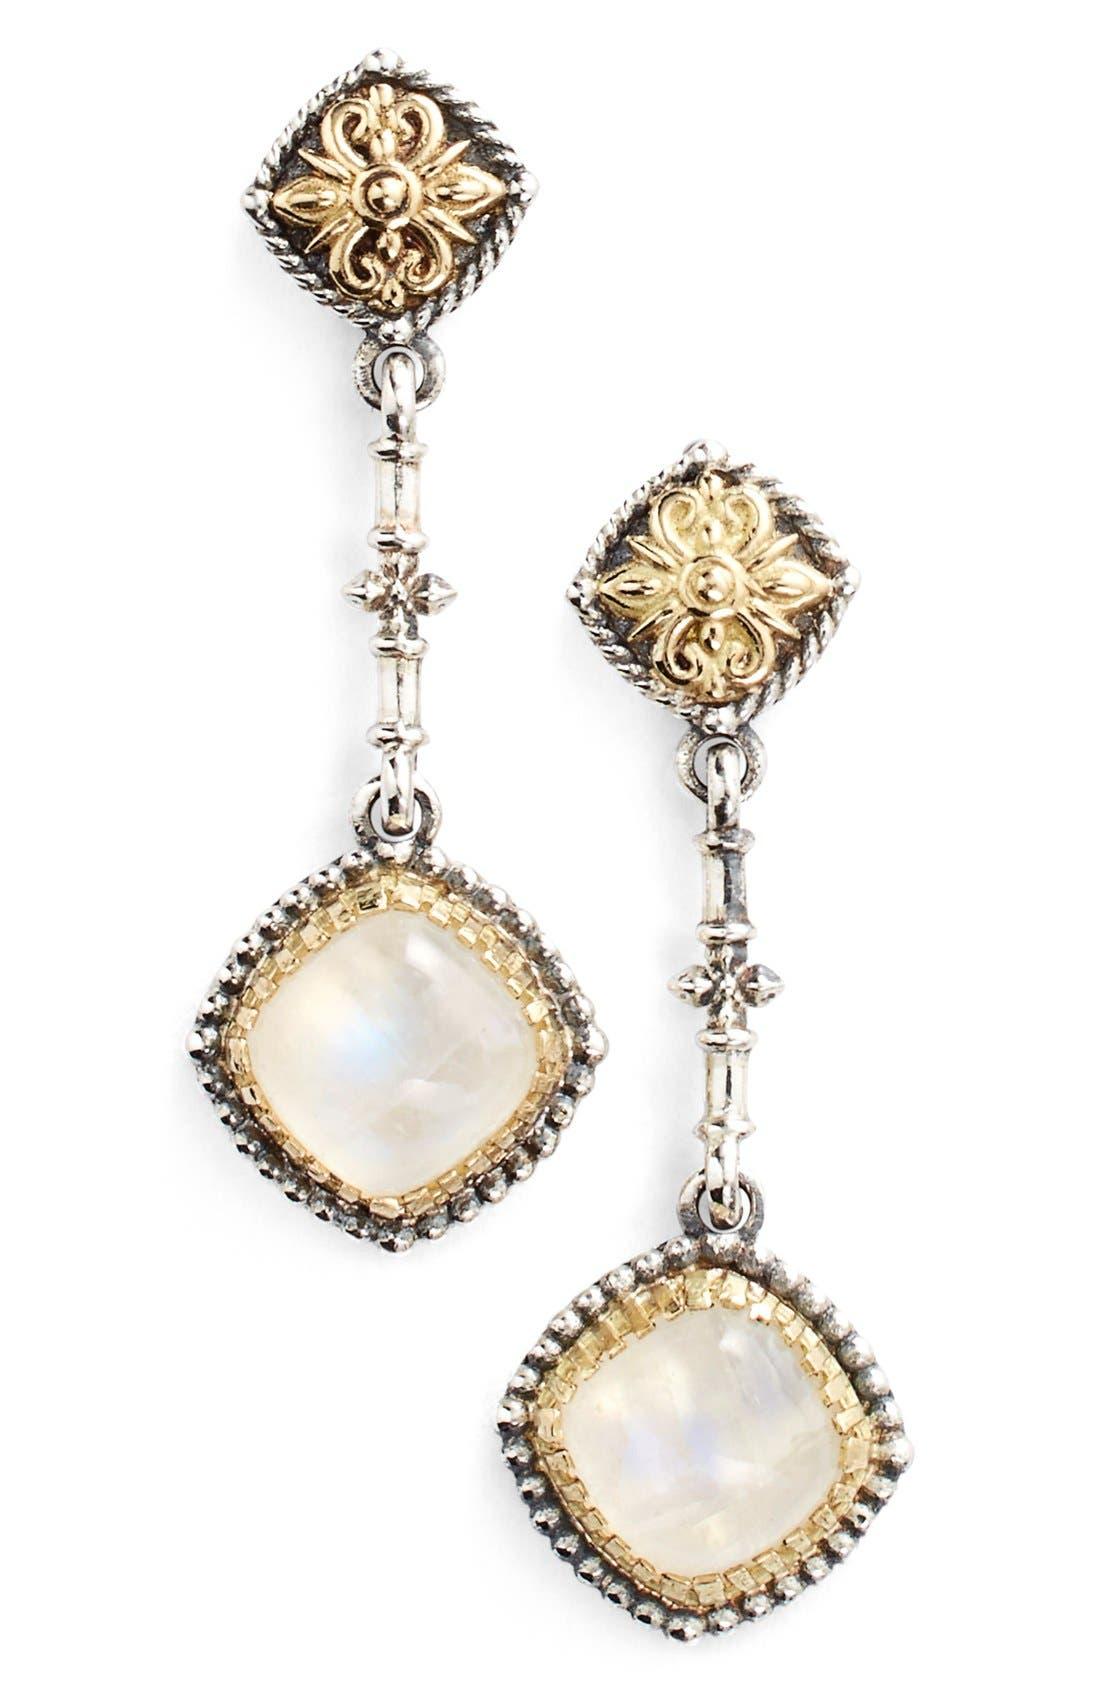 Alternate Image 1 Selected - Konstantino'Erato' Square Stone Drop Earrings